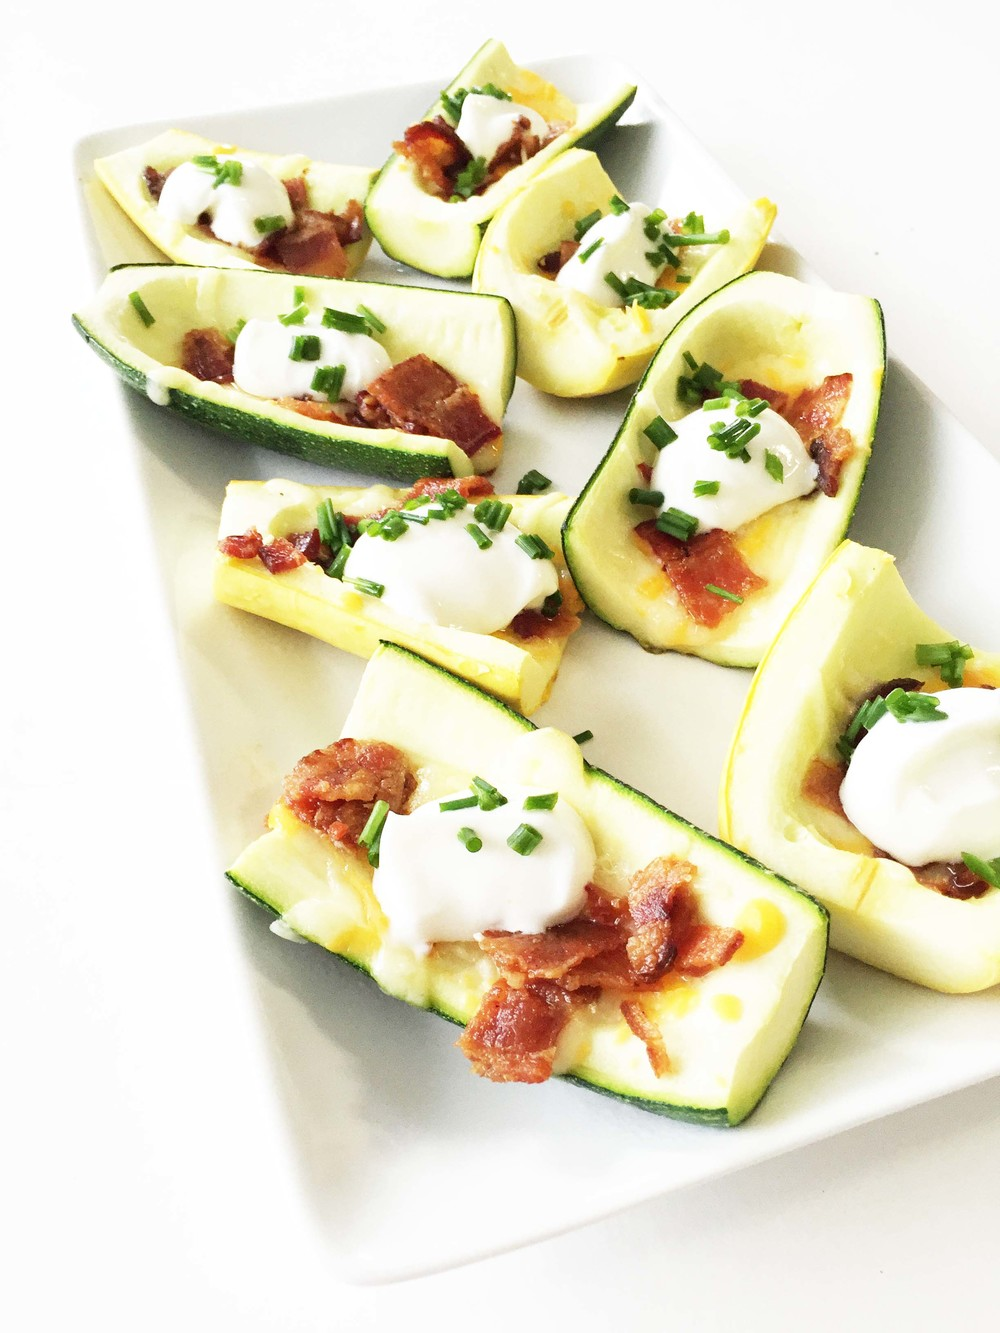 zucchini-skins4.jpg